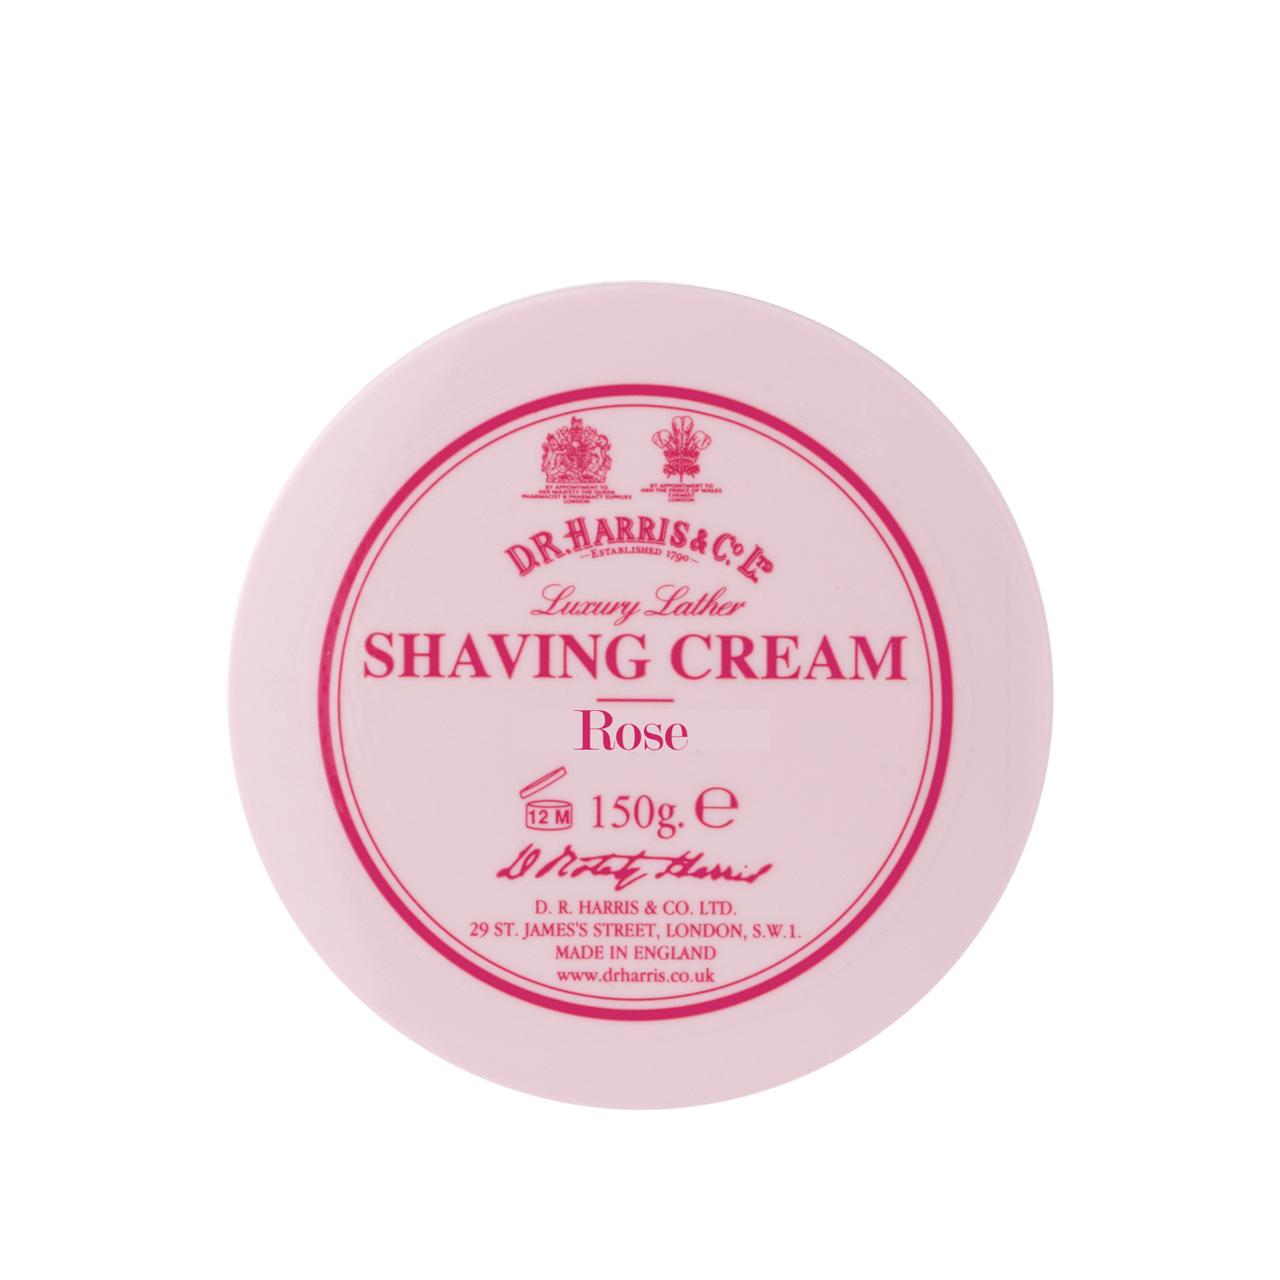 Rose - Shaving Cream Bowl